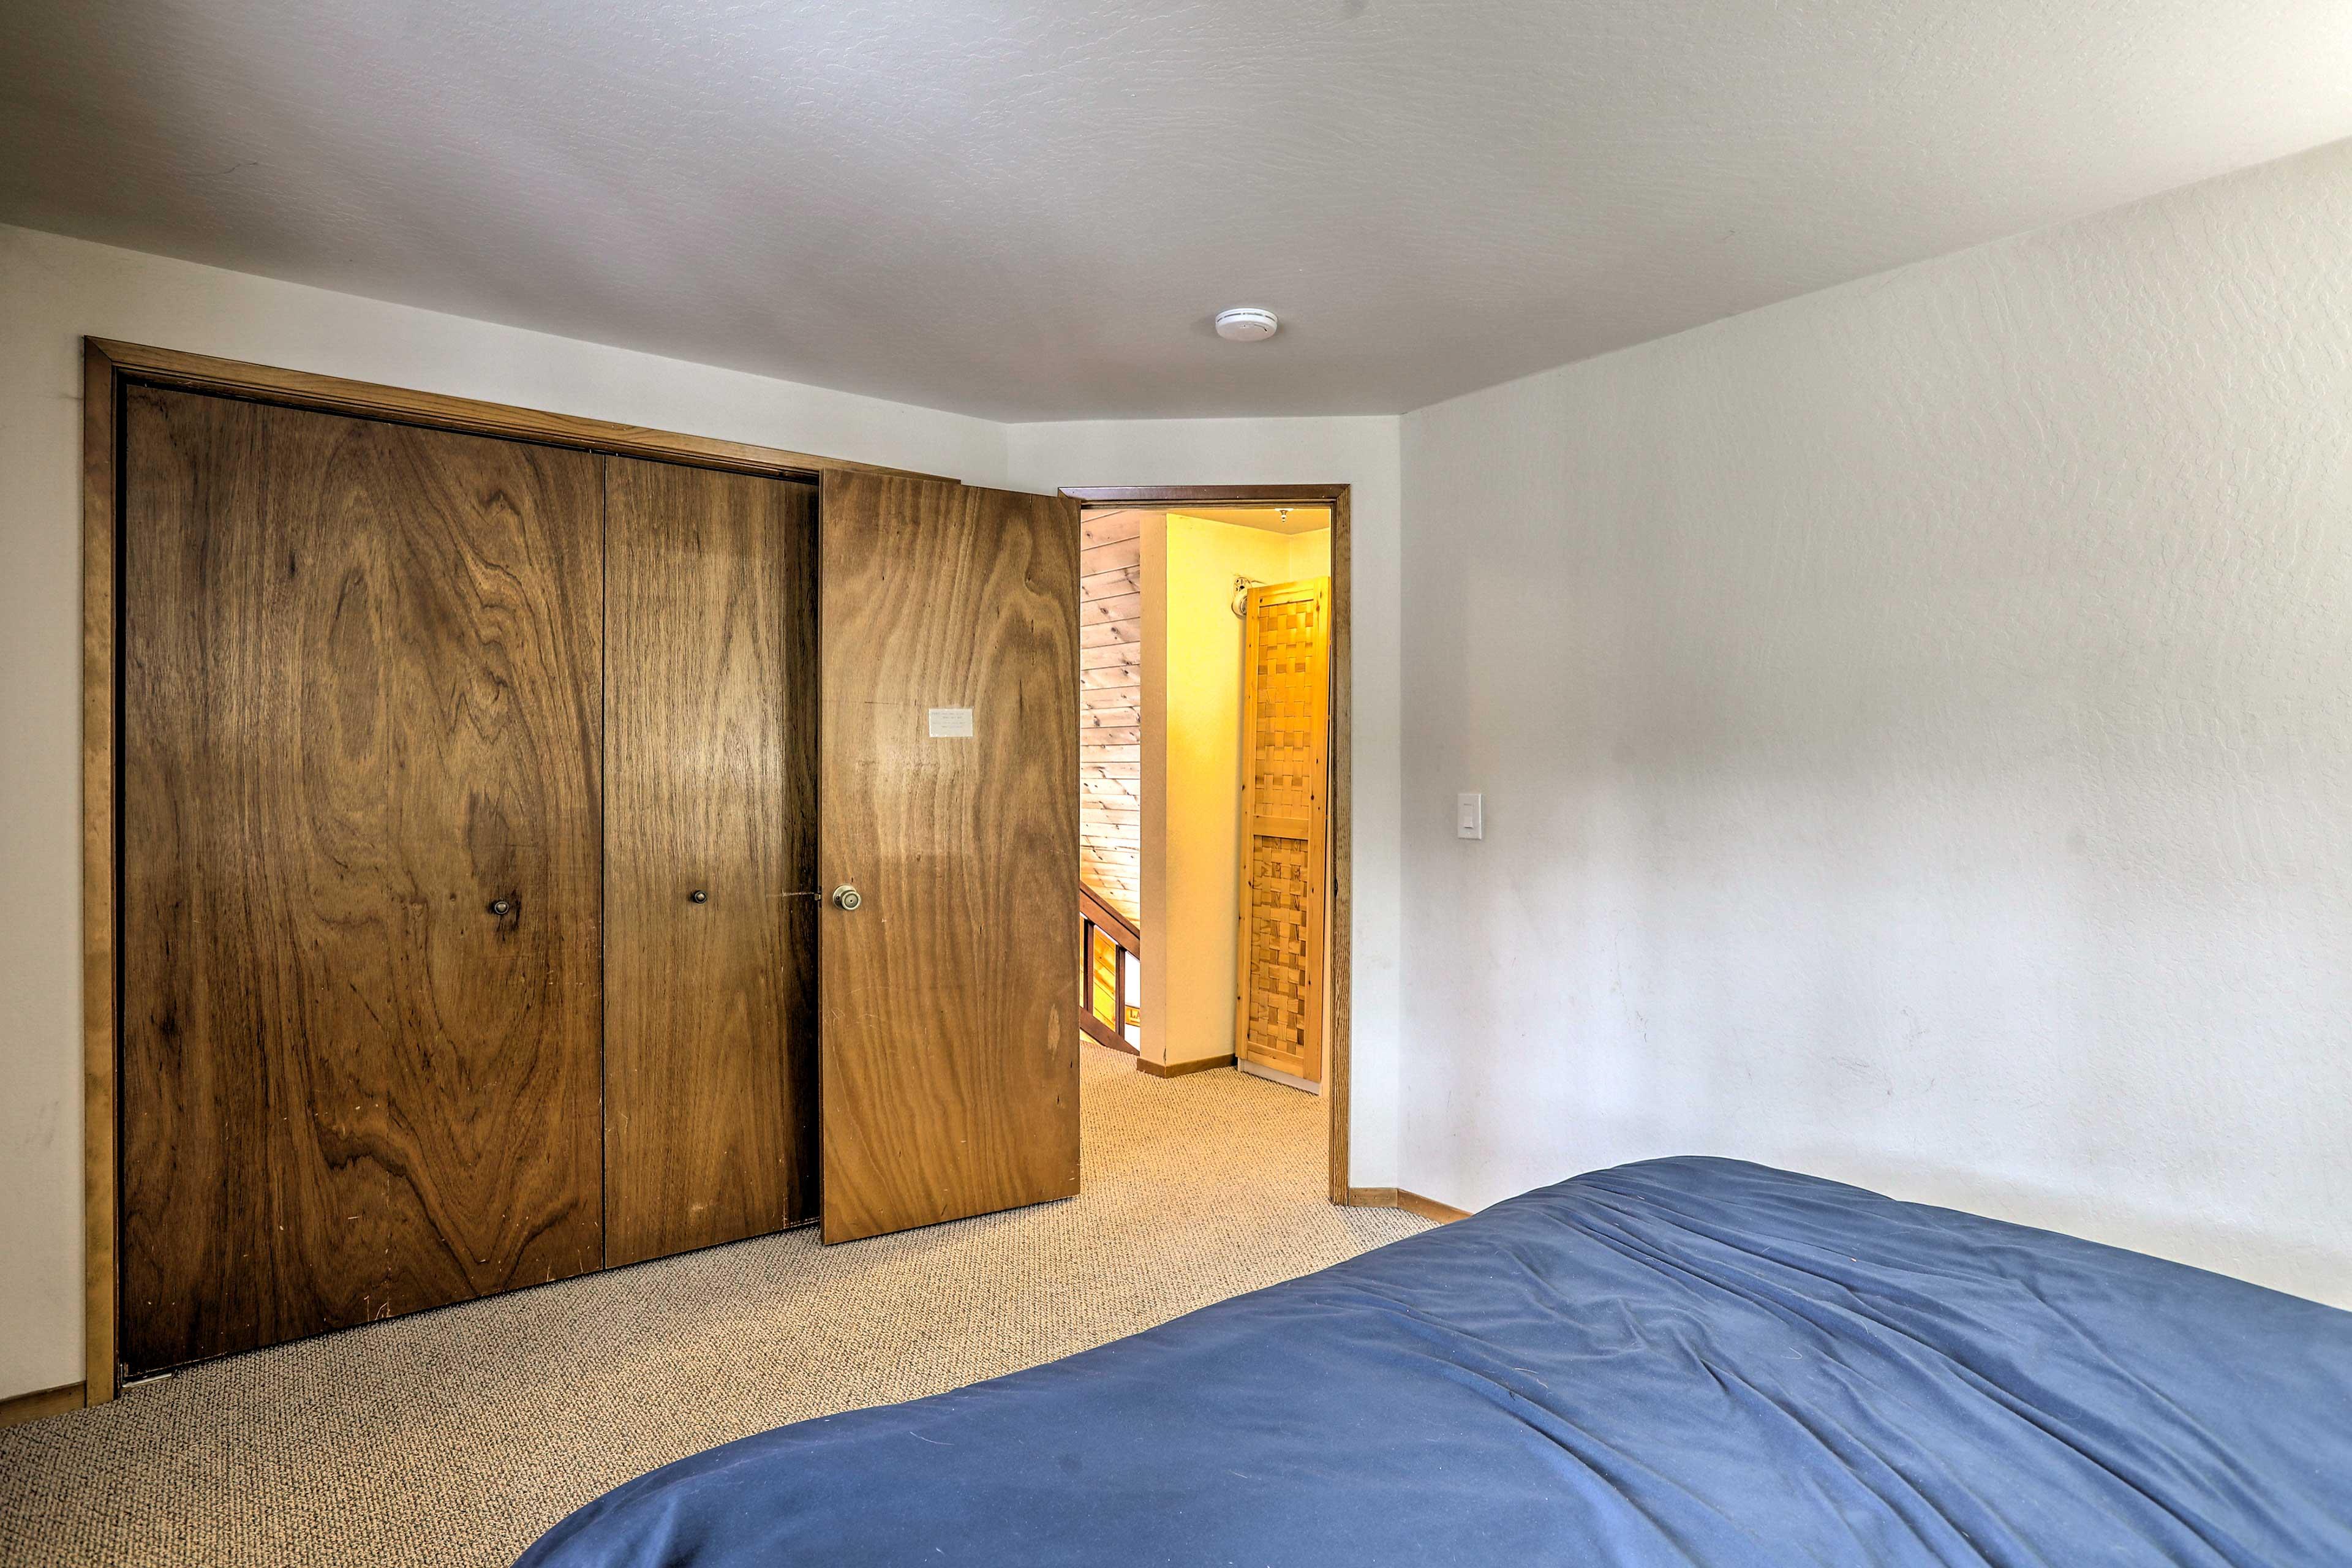 Feel free to unpack & organize using this spacious closet!